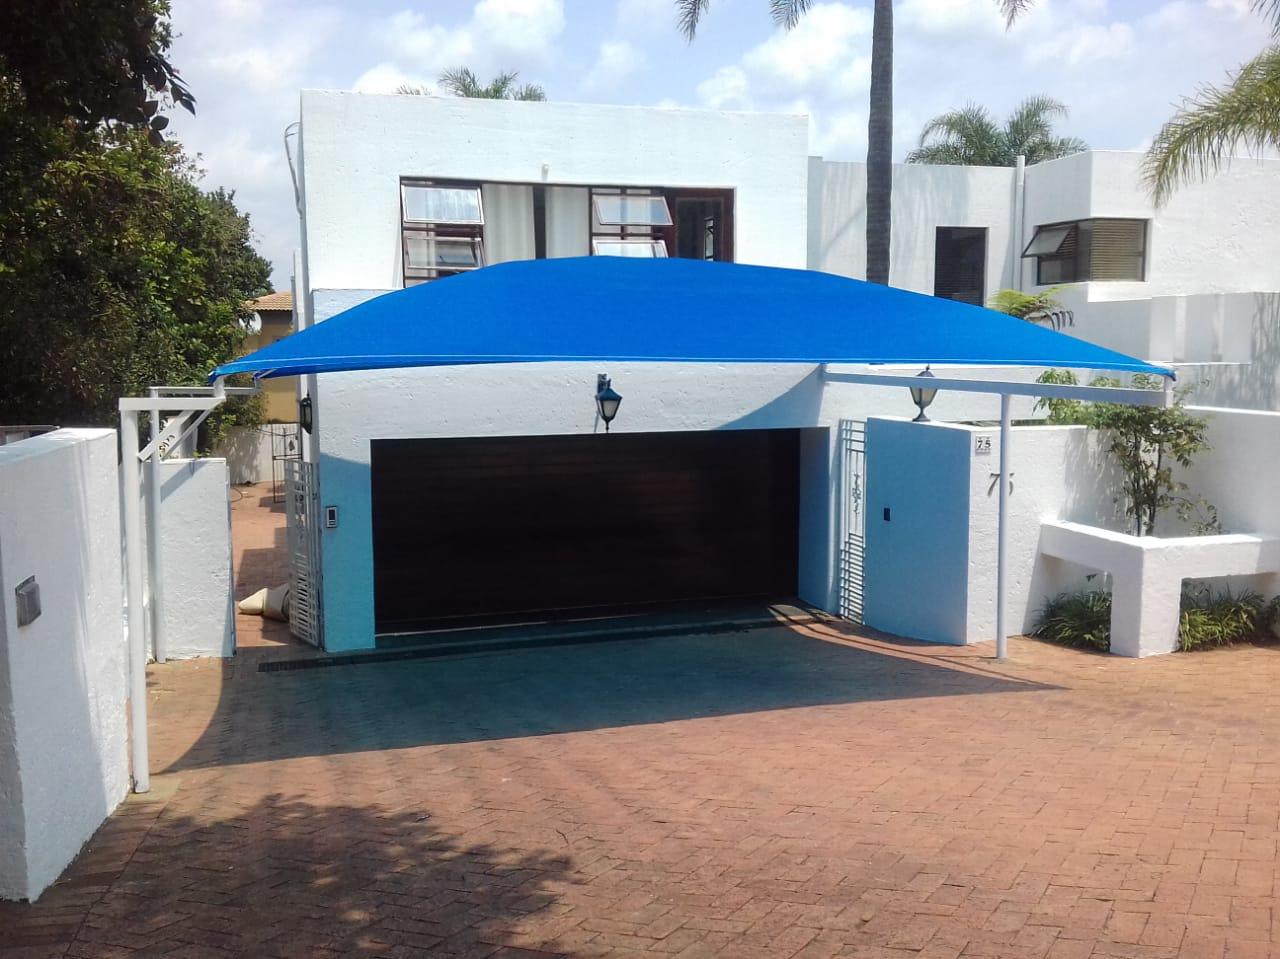 Shade Cloth Carports Cape Town - Carports Garages